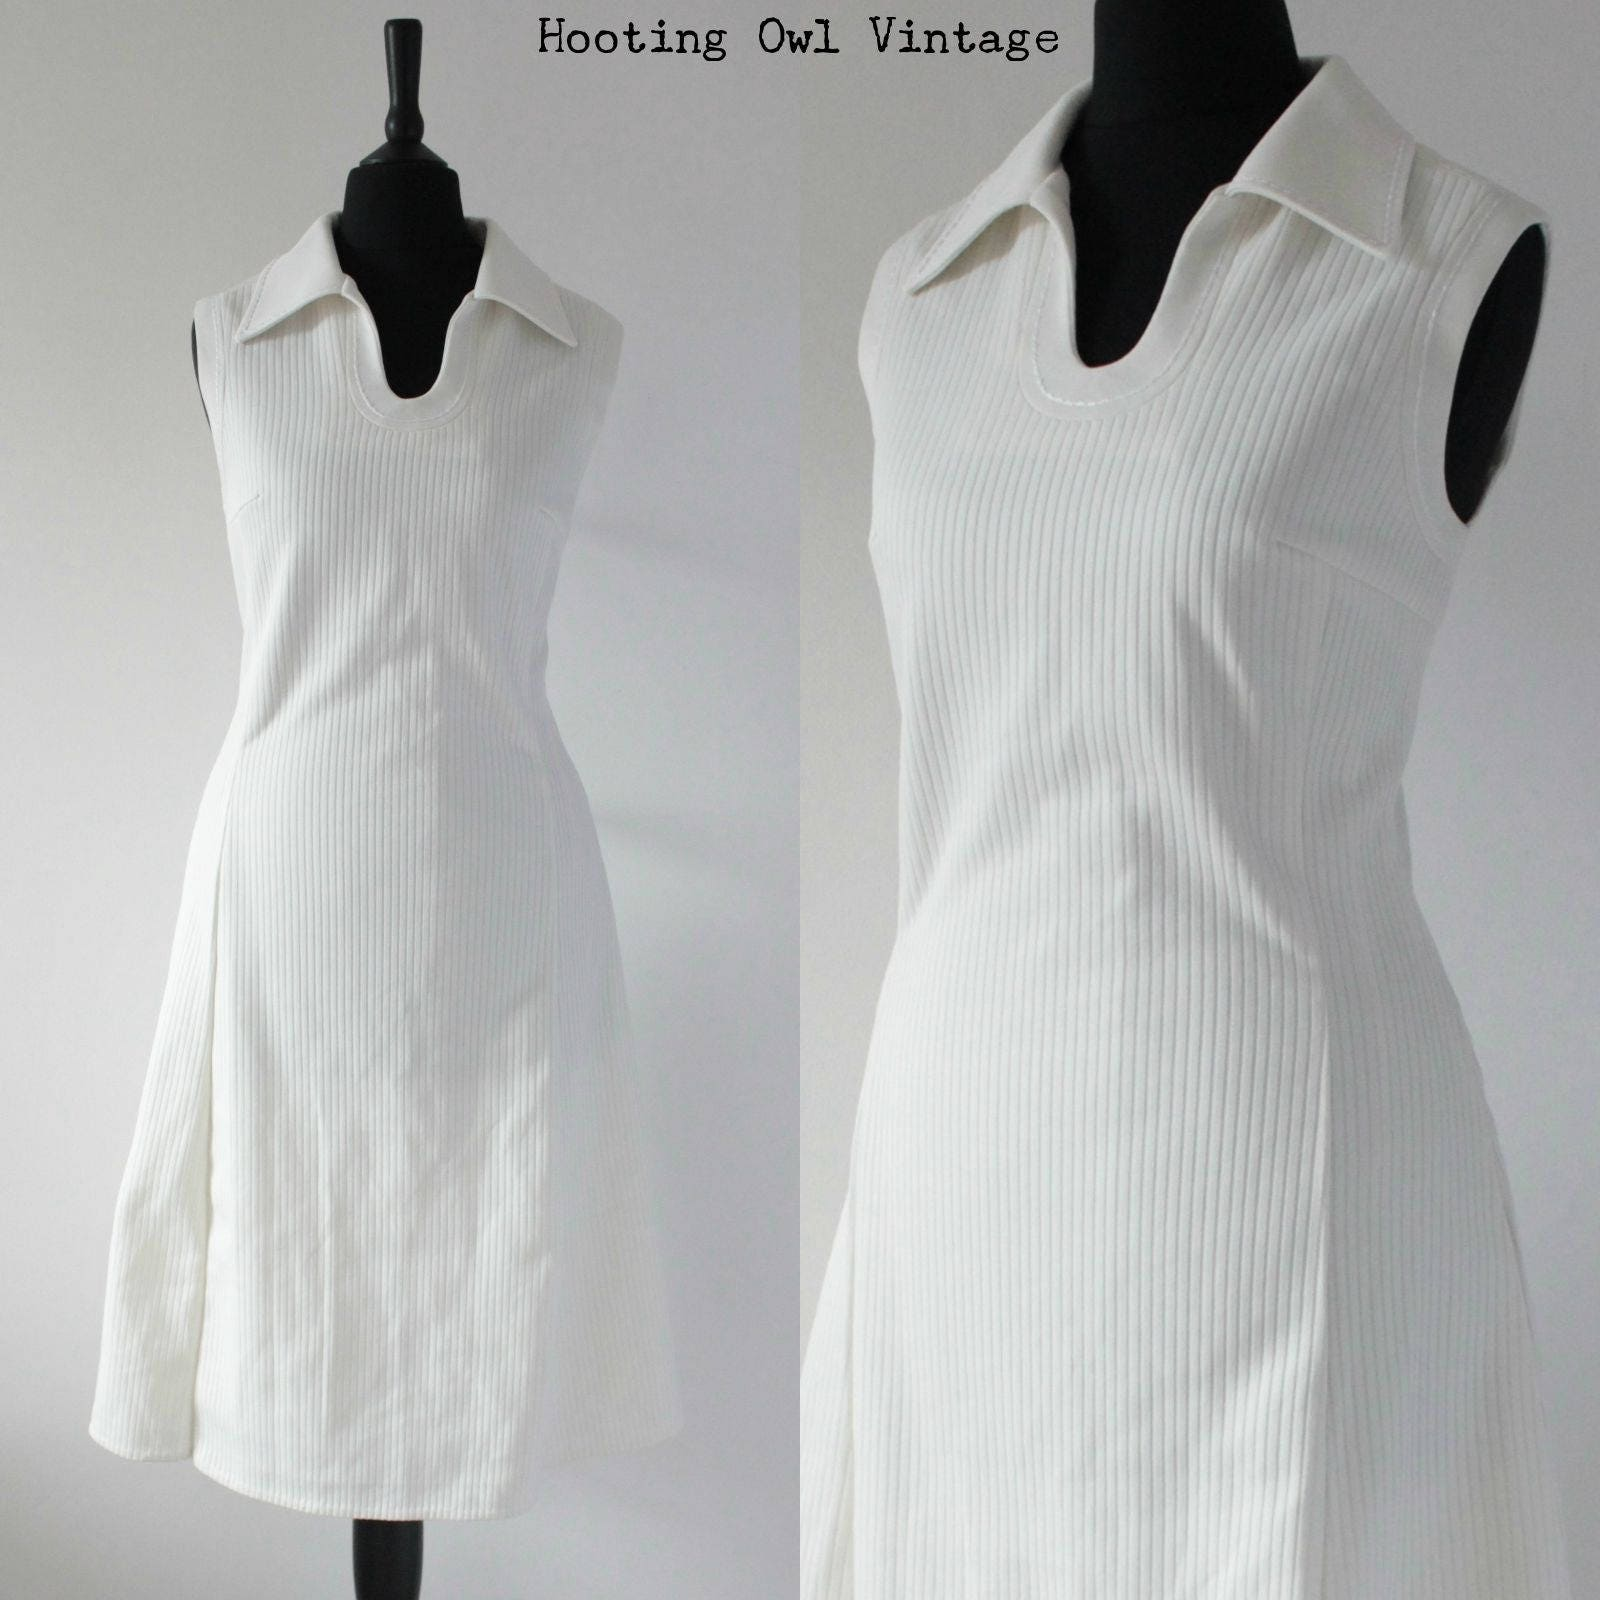 White Vintage 1960s Mod Dress 60s RETRO Tennis Midi Dress Big Collar SCOOTER Gogo Sixties Dress UK 10 Small S